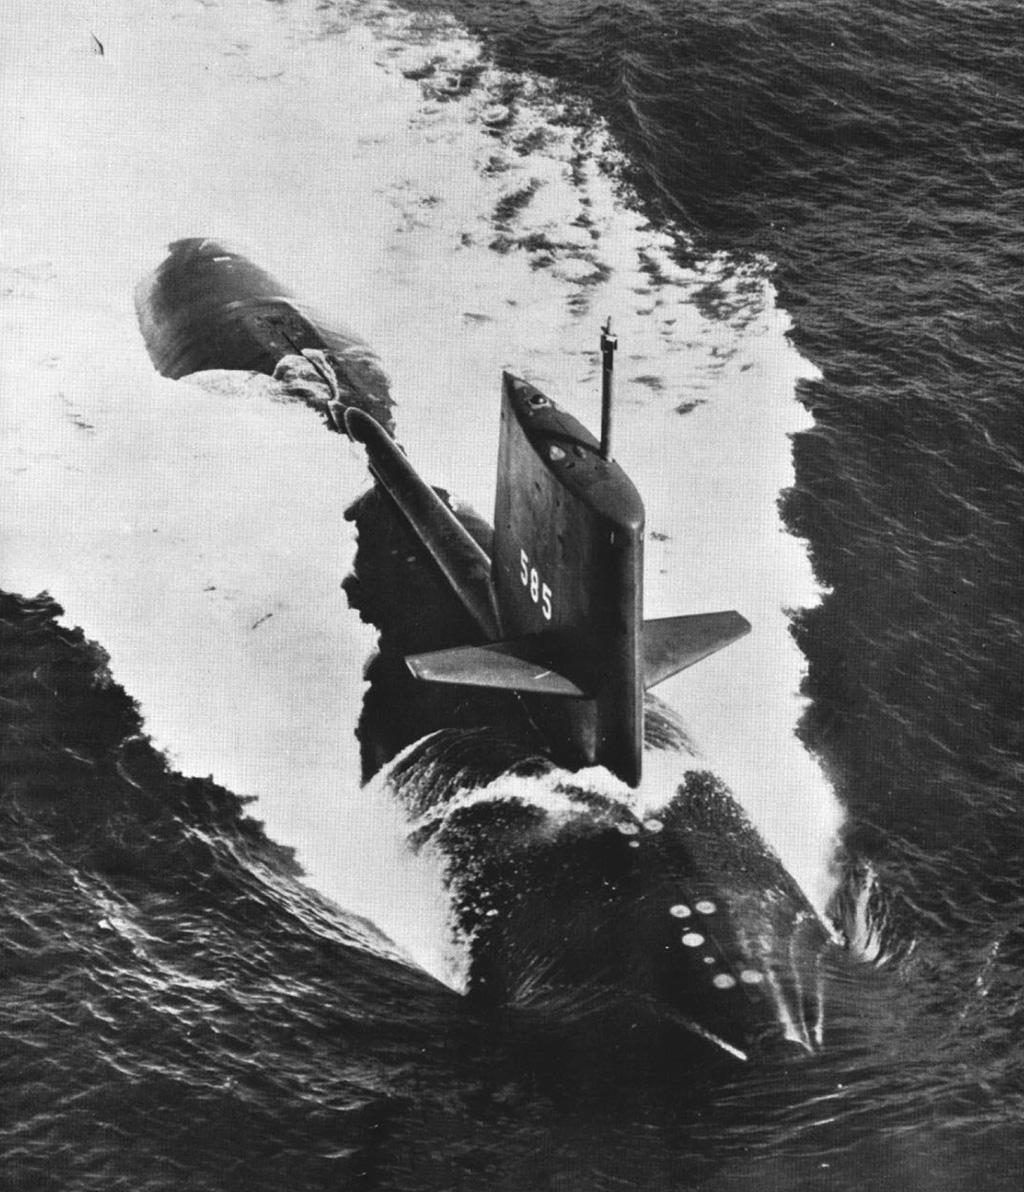 USSSkipjackSSN-585